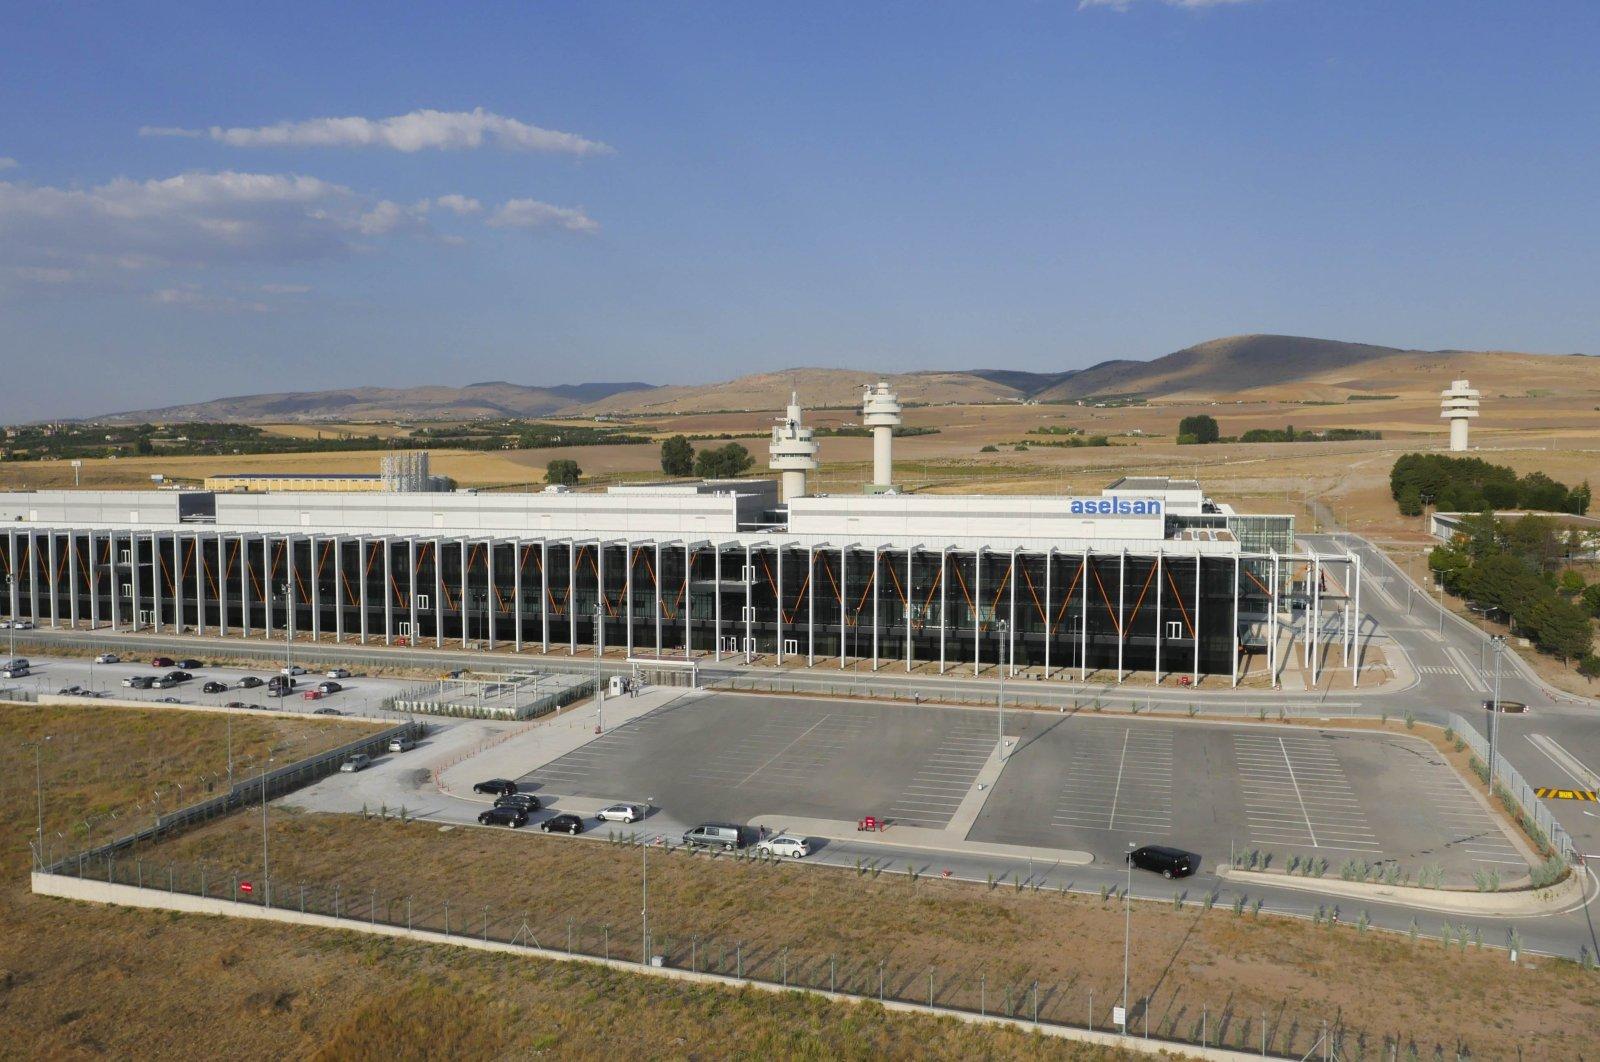 ASELSAN's radar and electronic warfare technologies center, Gölbaşı district, capital Ankara, Turkey, Aug. 20, 2020. (Sabah Photo)